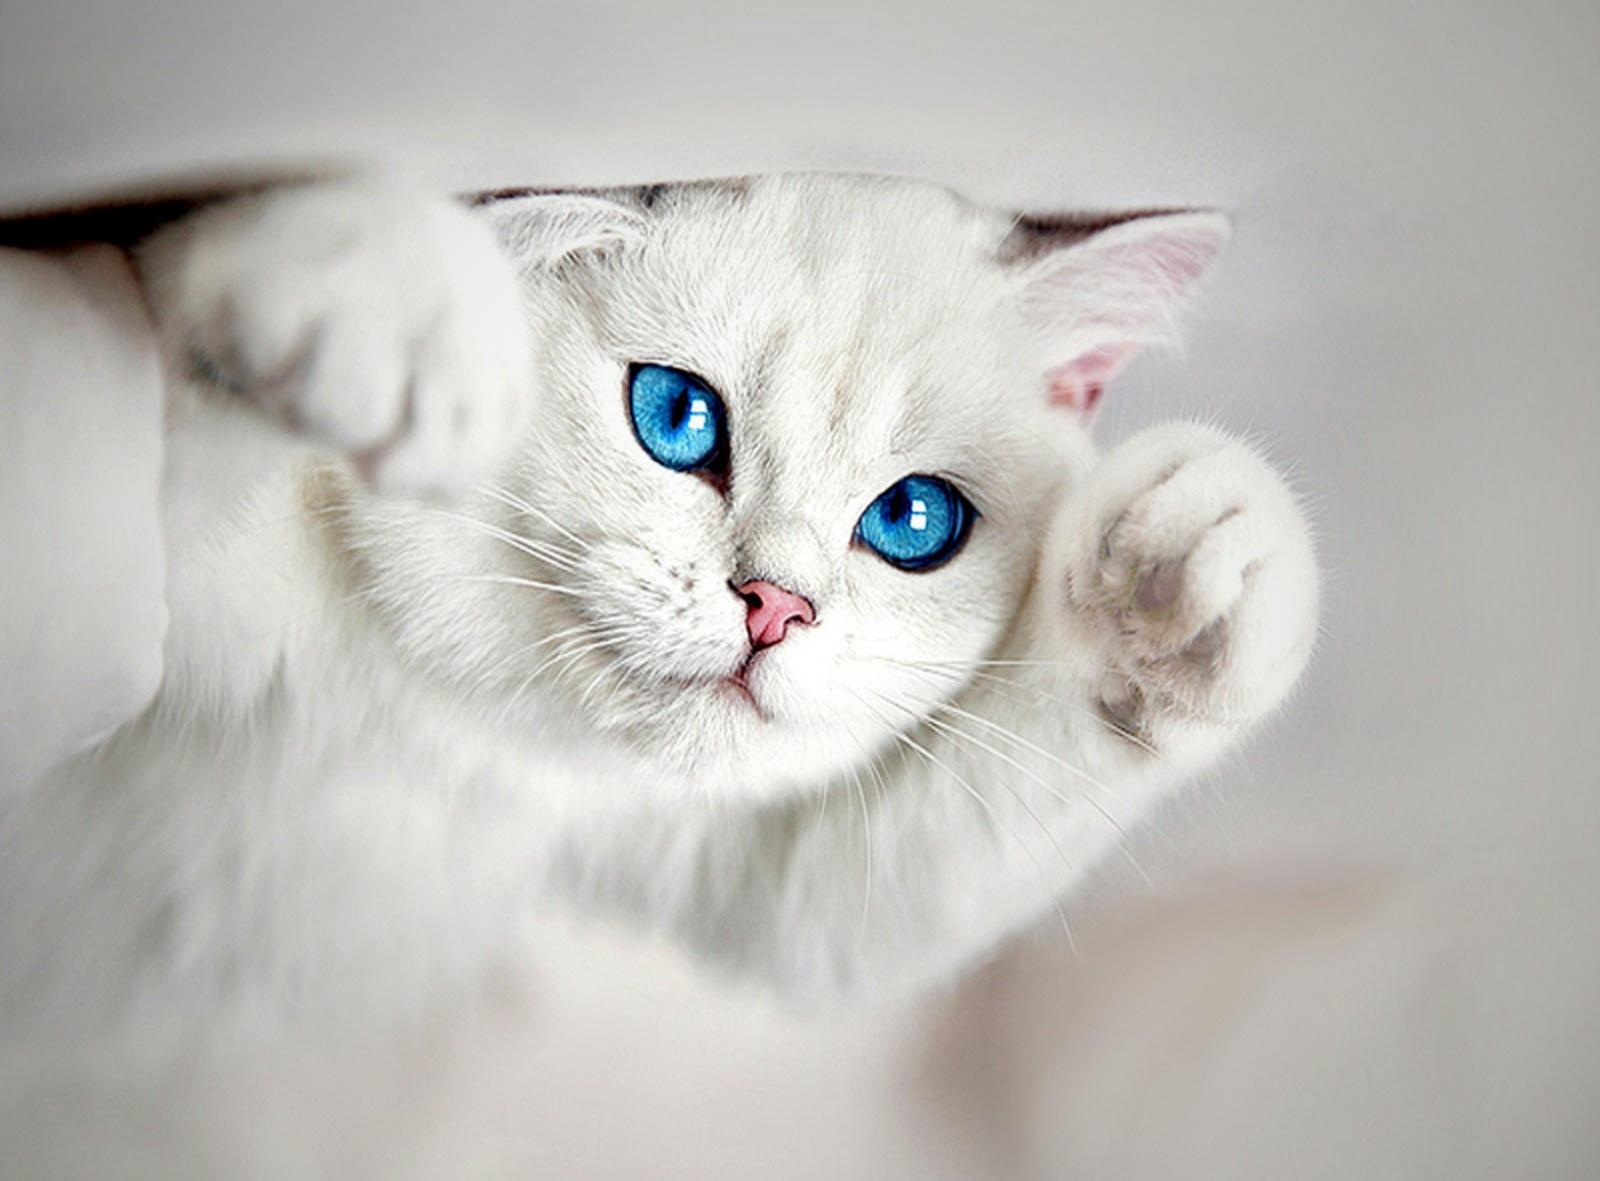 Gambar Kucing Frustasi godean.web.id